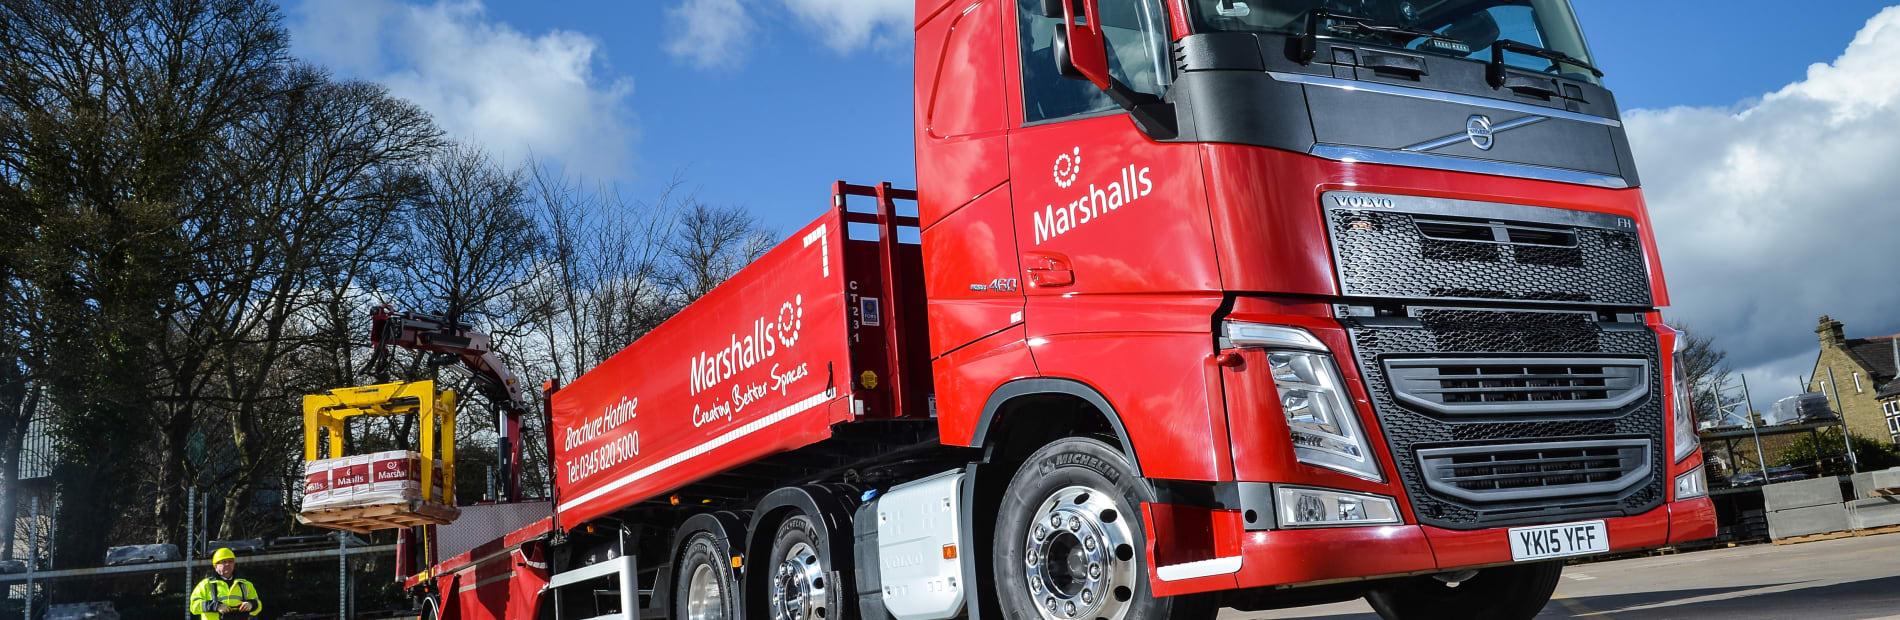 marshalls truck